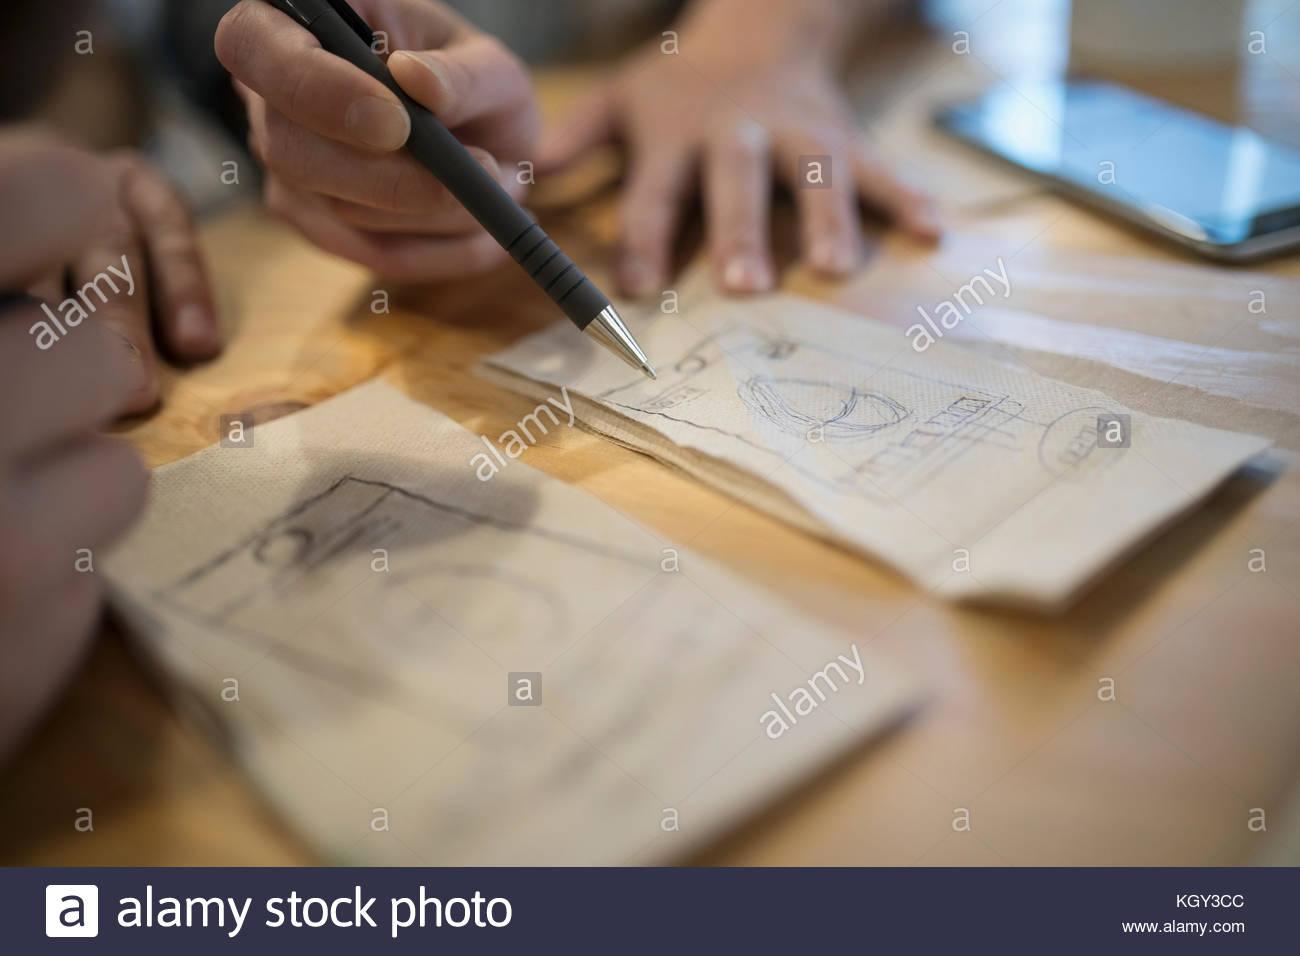 Close up creative designers brainstorming ideas on napkins - Stock Image